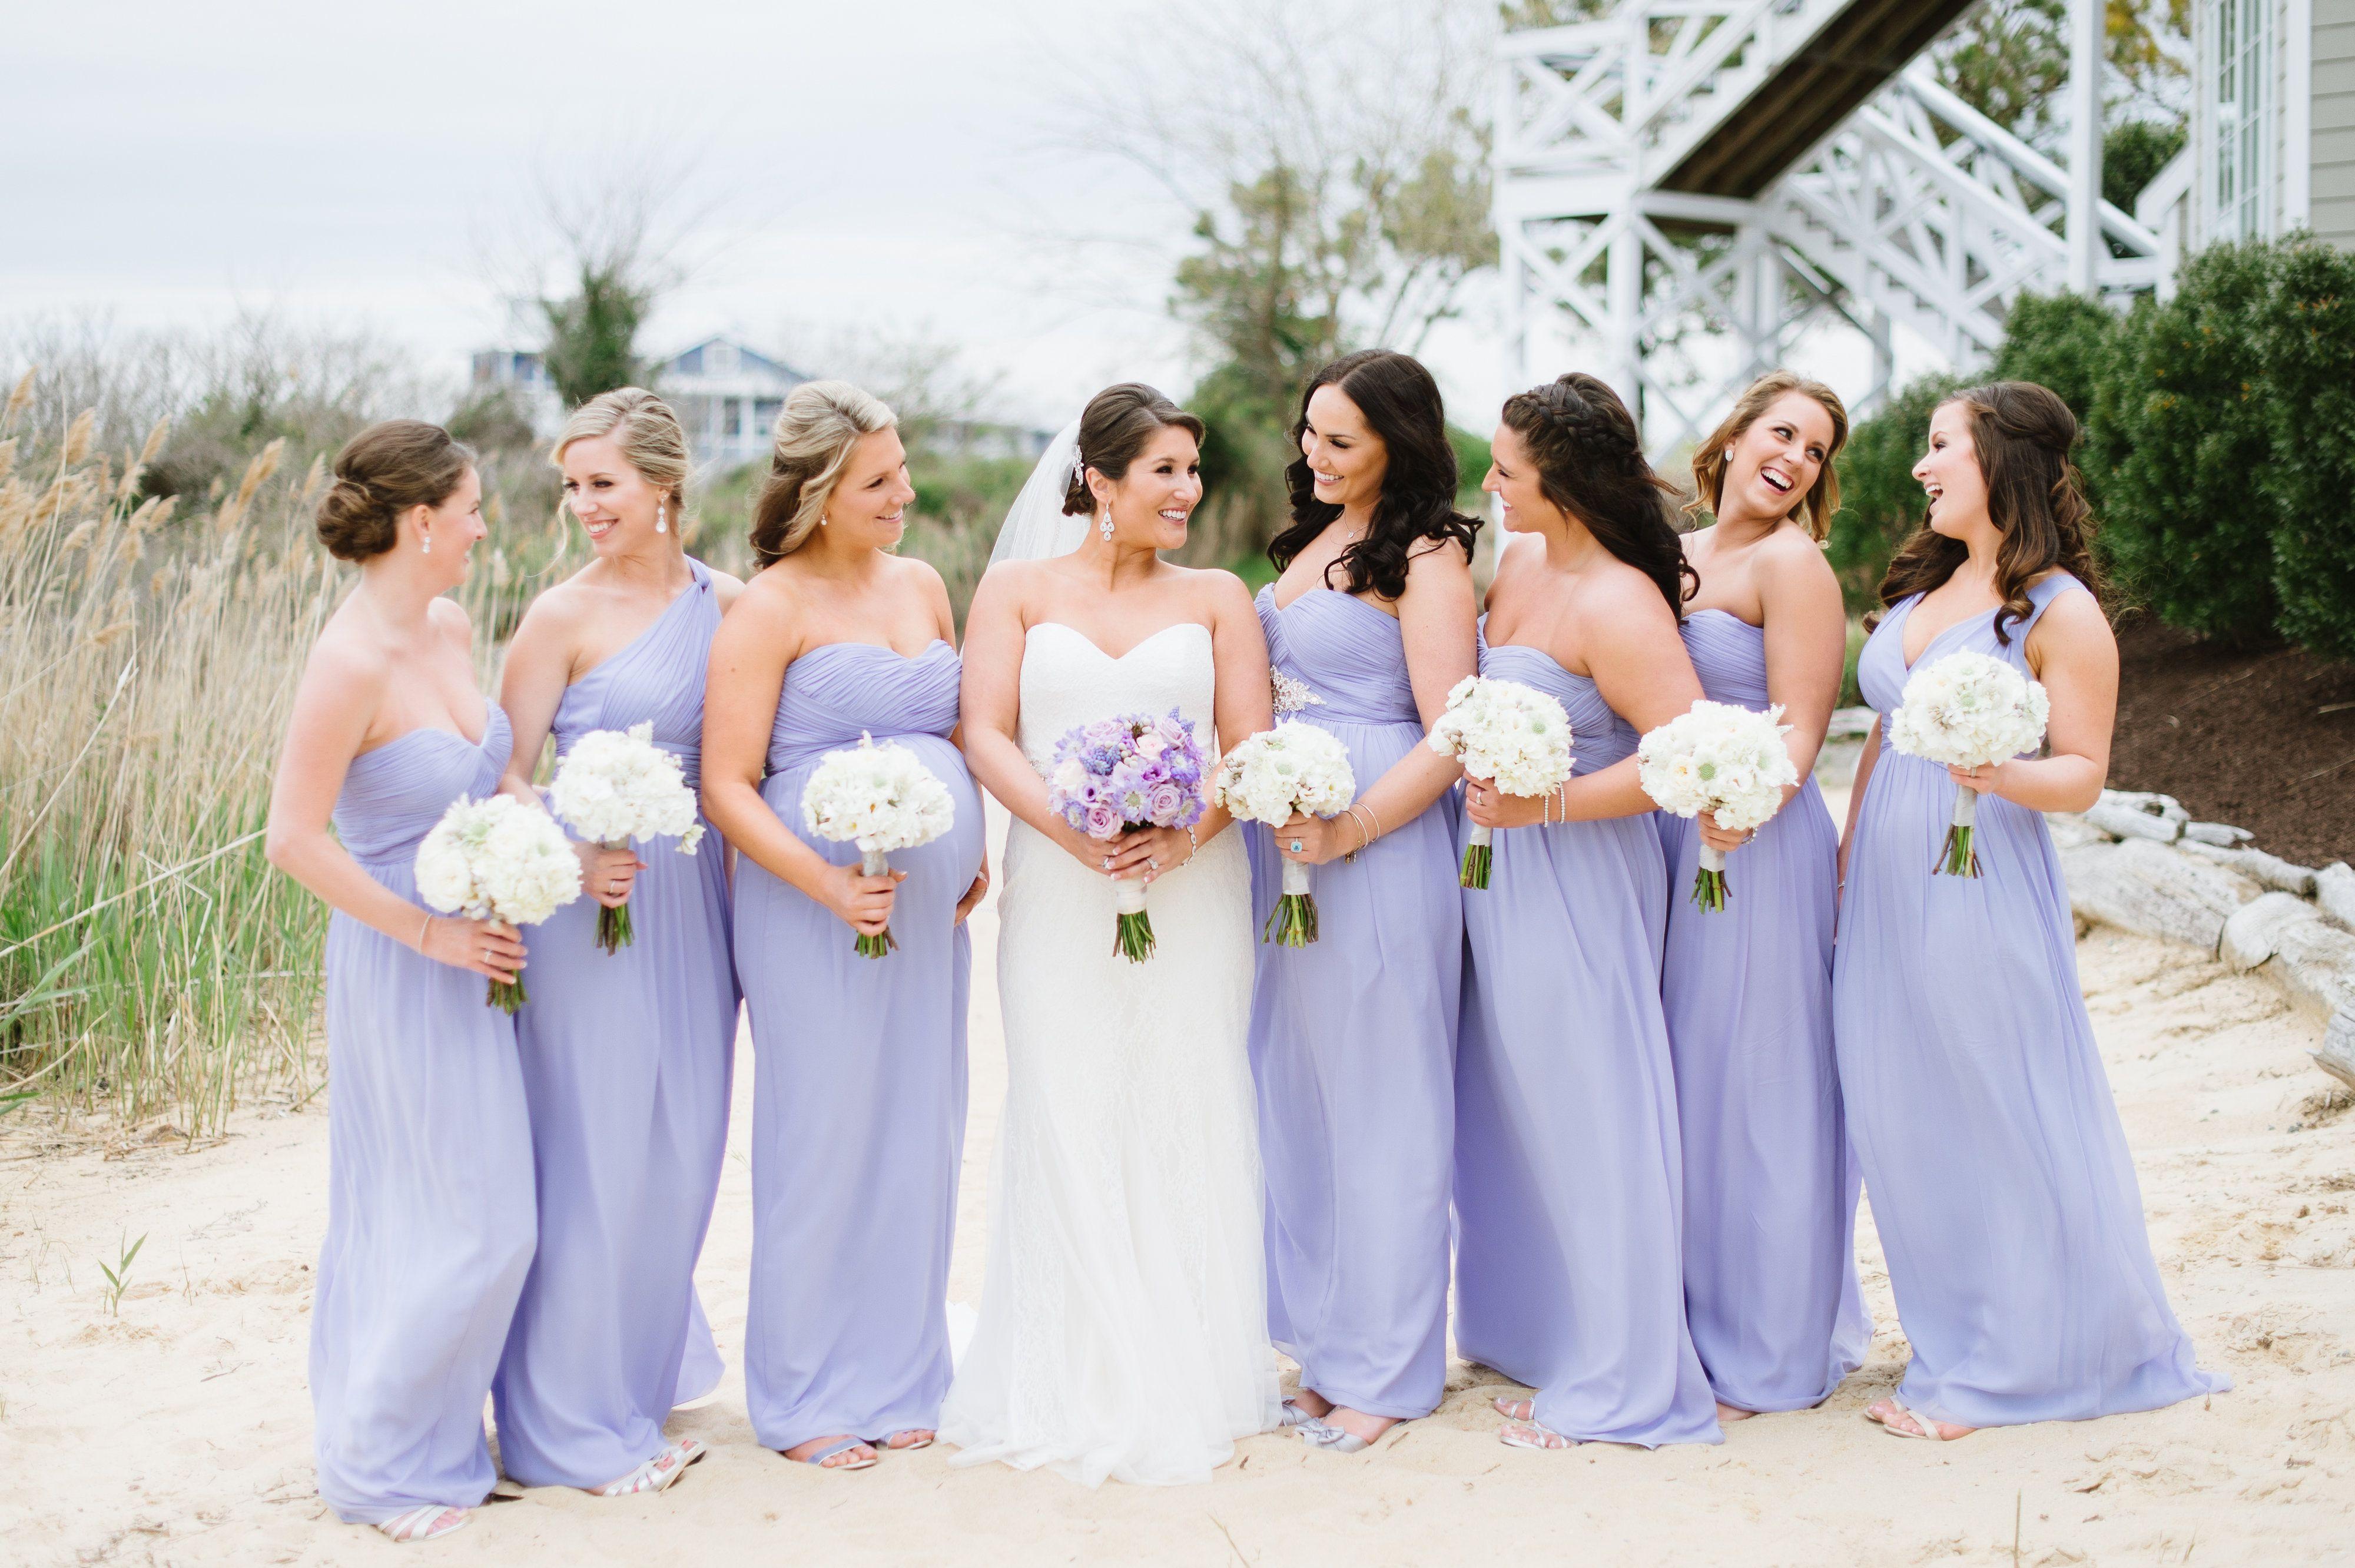 dd1793d549b0 Donna Morgan Iris bridesmaid dresses // Donna Morgan wedding // Purple  bridesmaids //